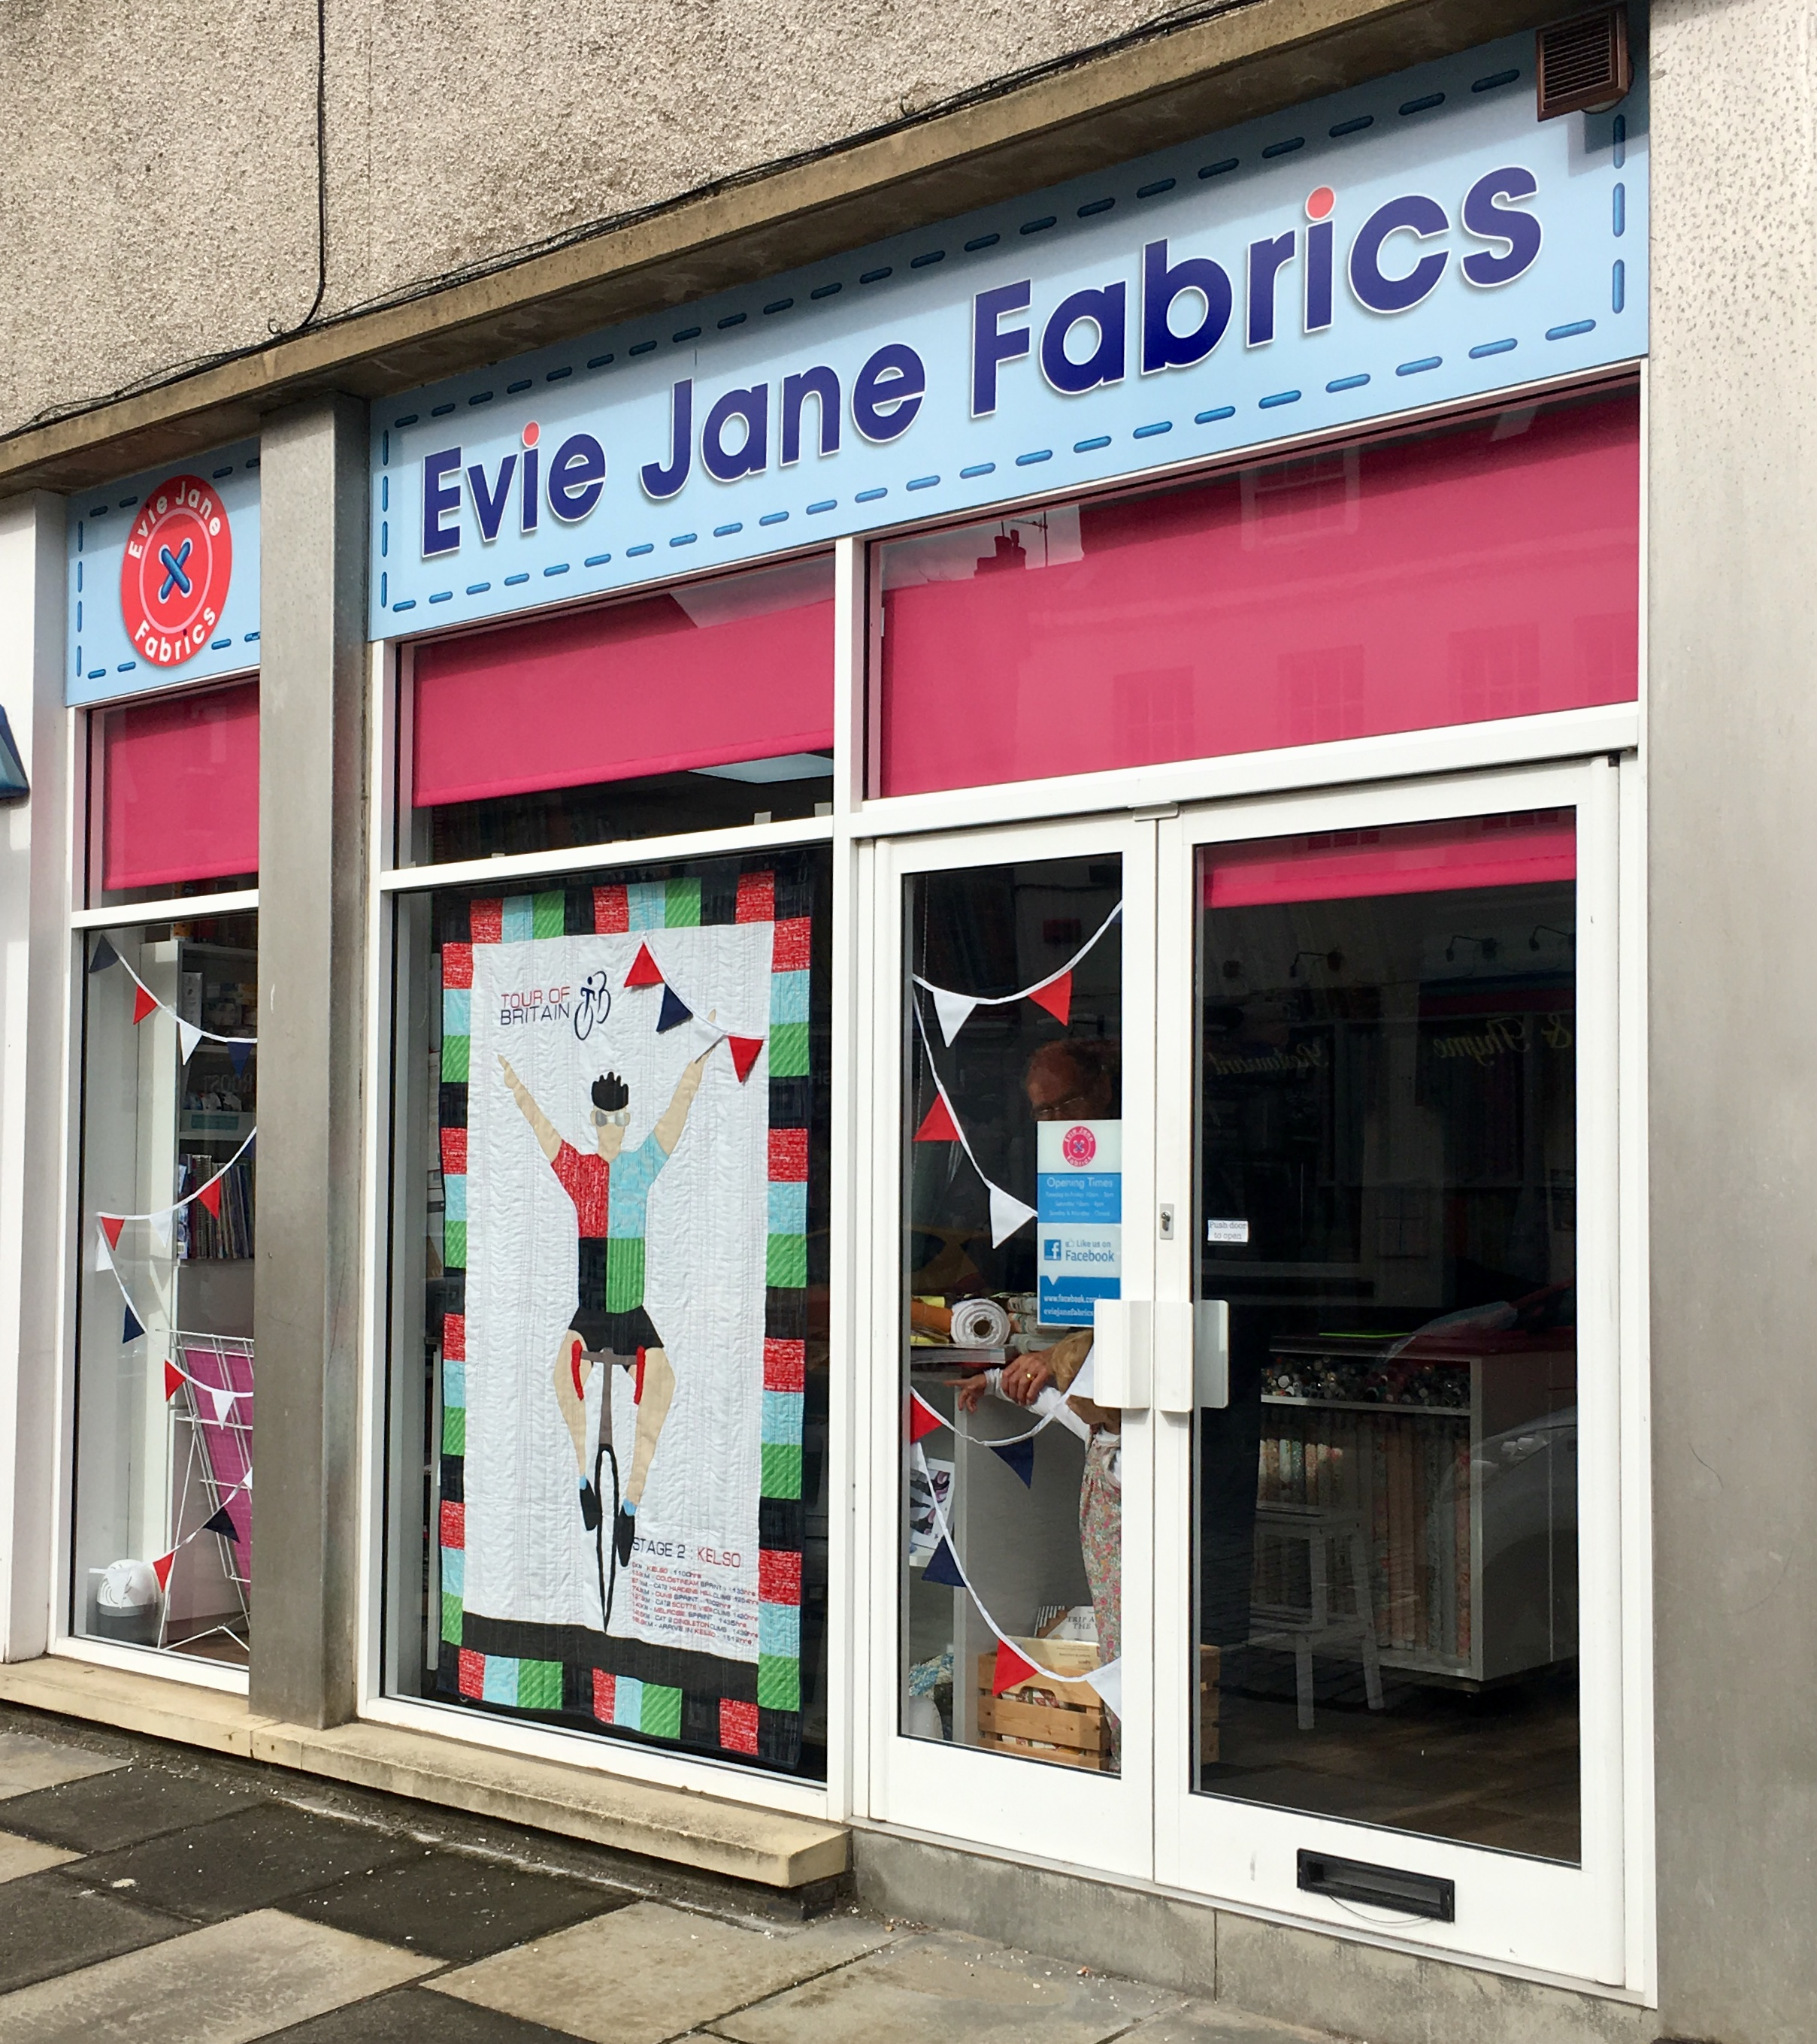 Evie Jane Fabrics